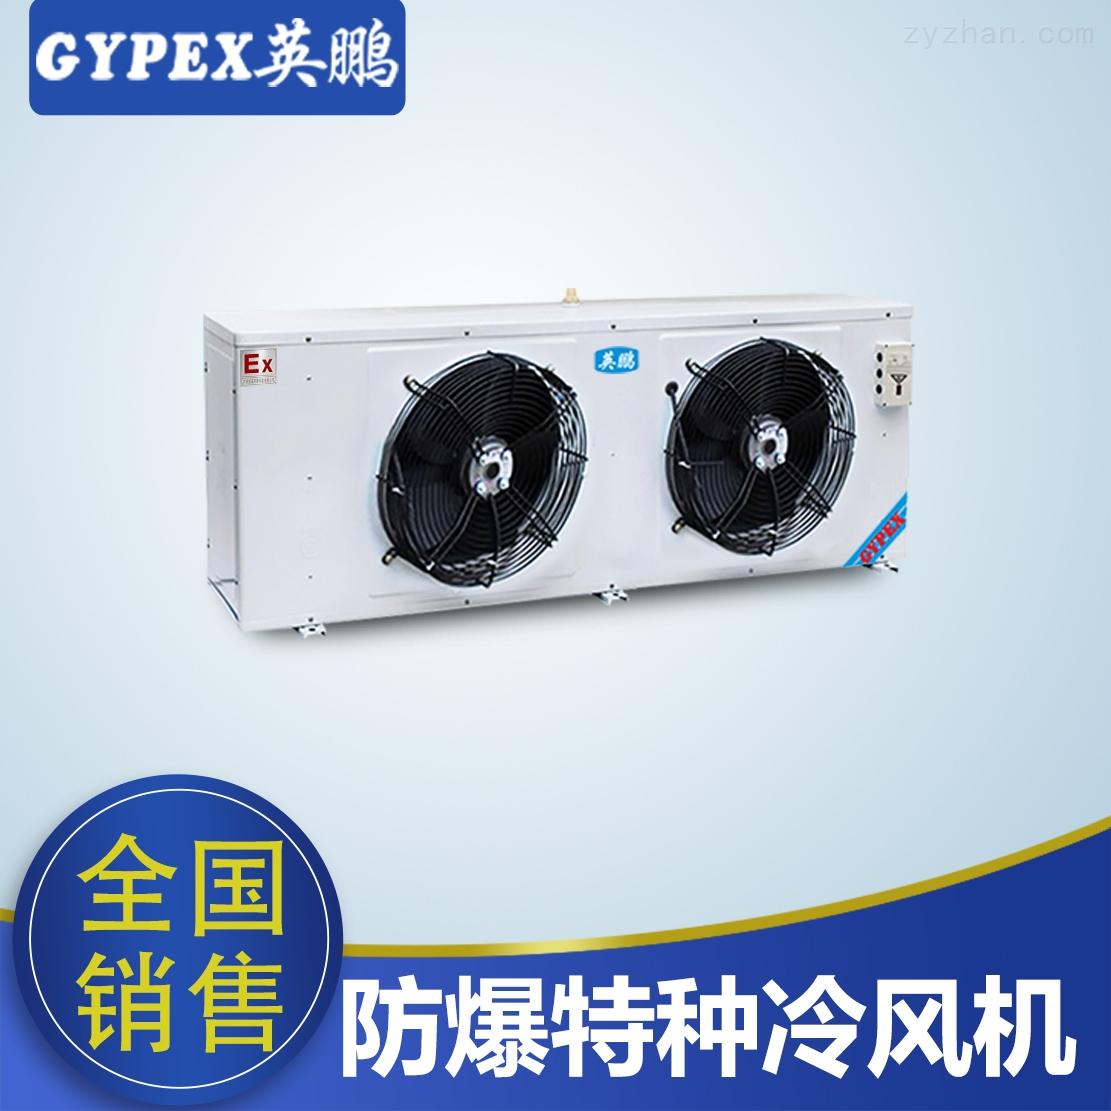 DJ-40英鵬防爆特種冷風機